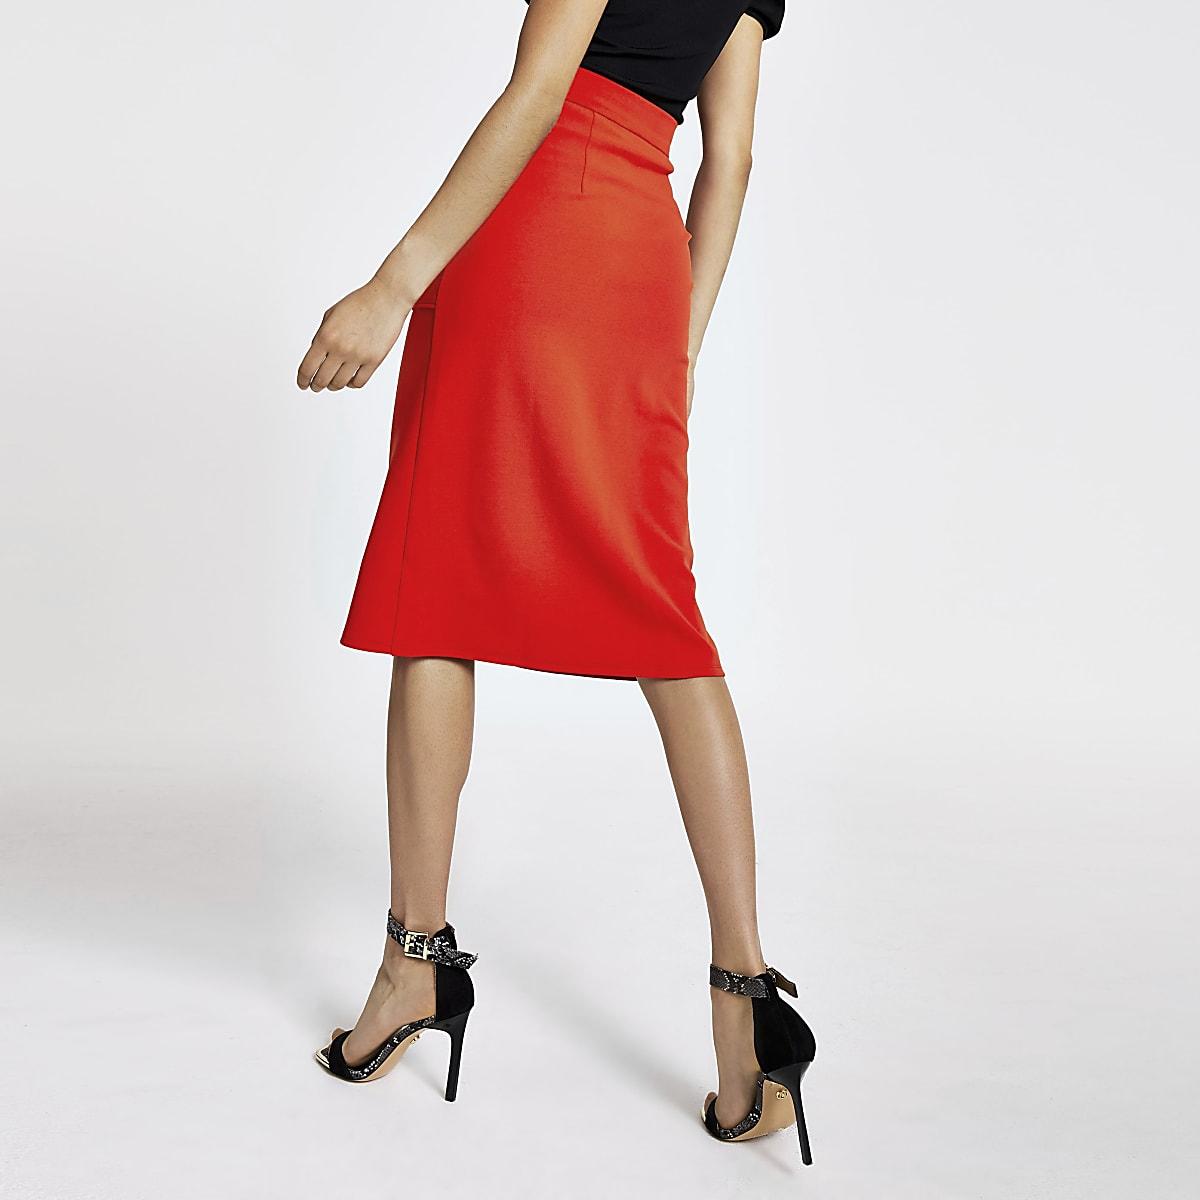 98825b2529 Red zip front pencil skirt - Midi Skirts - Skirts - women